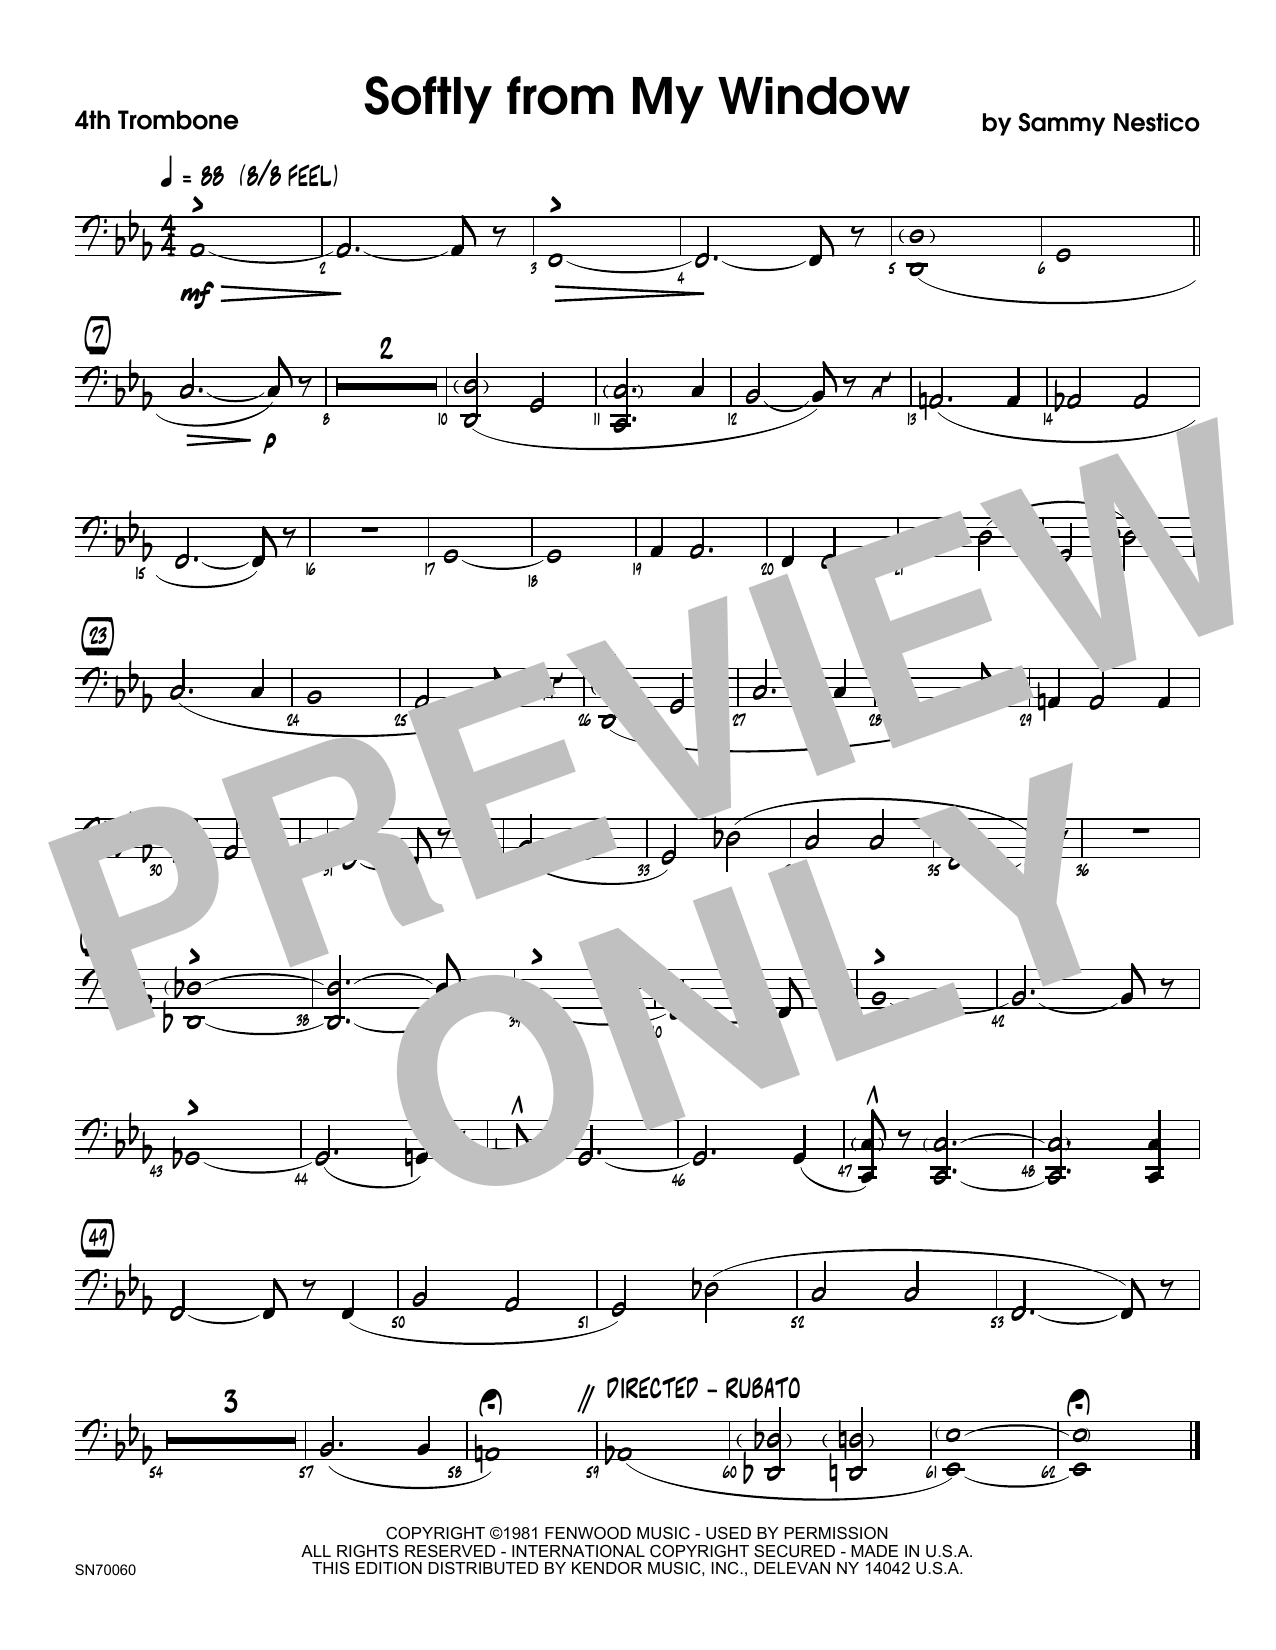 Softly From My Window - 4th Trombone Sheet Music